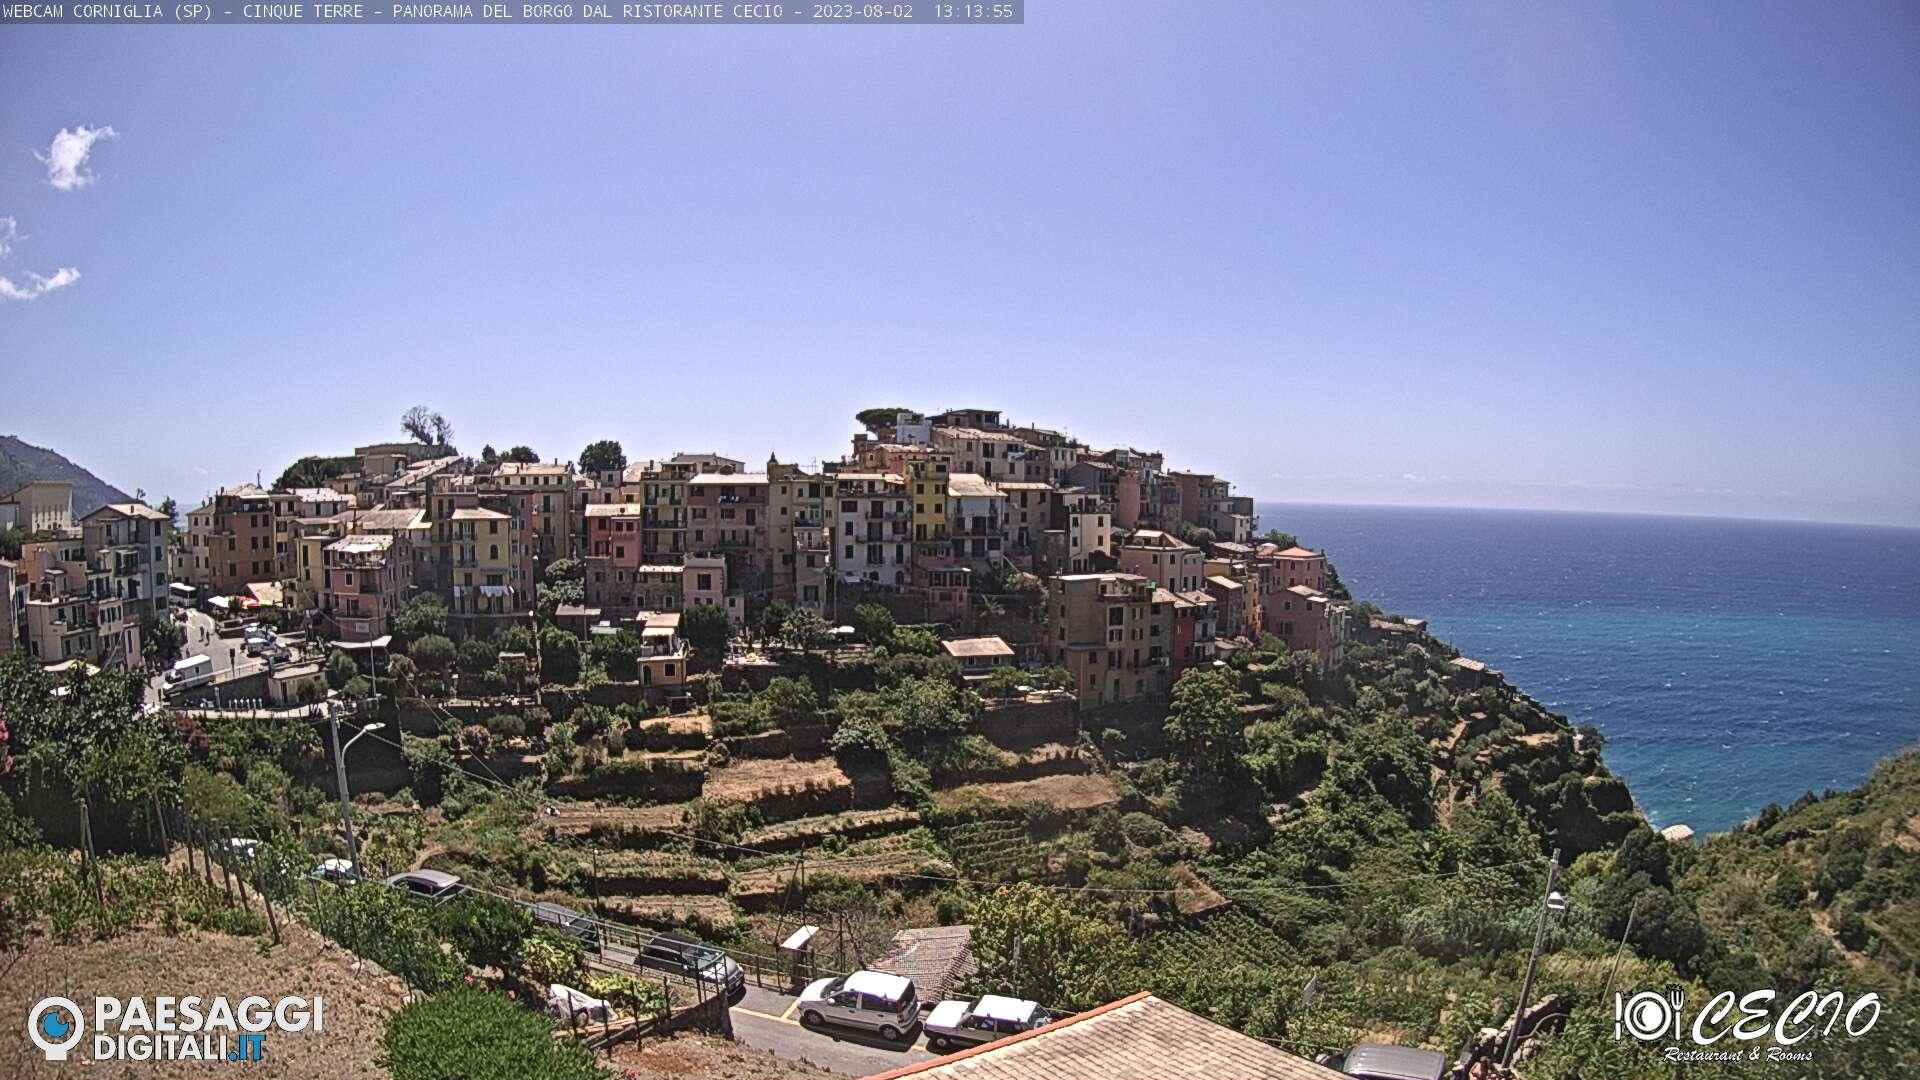 Webcam à Manarola, Cinque Terre